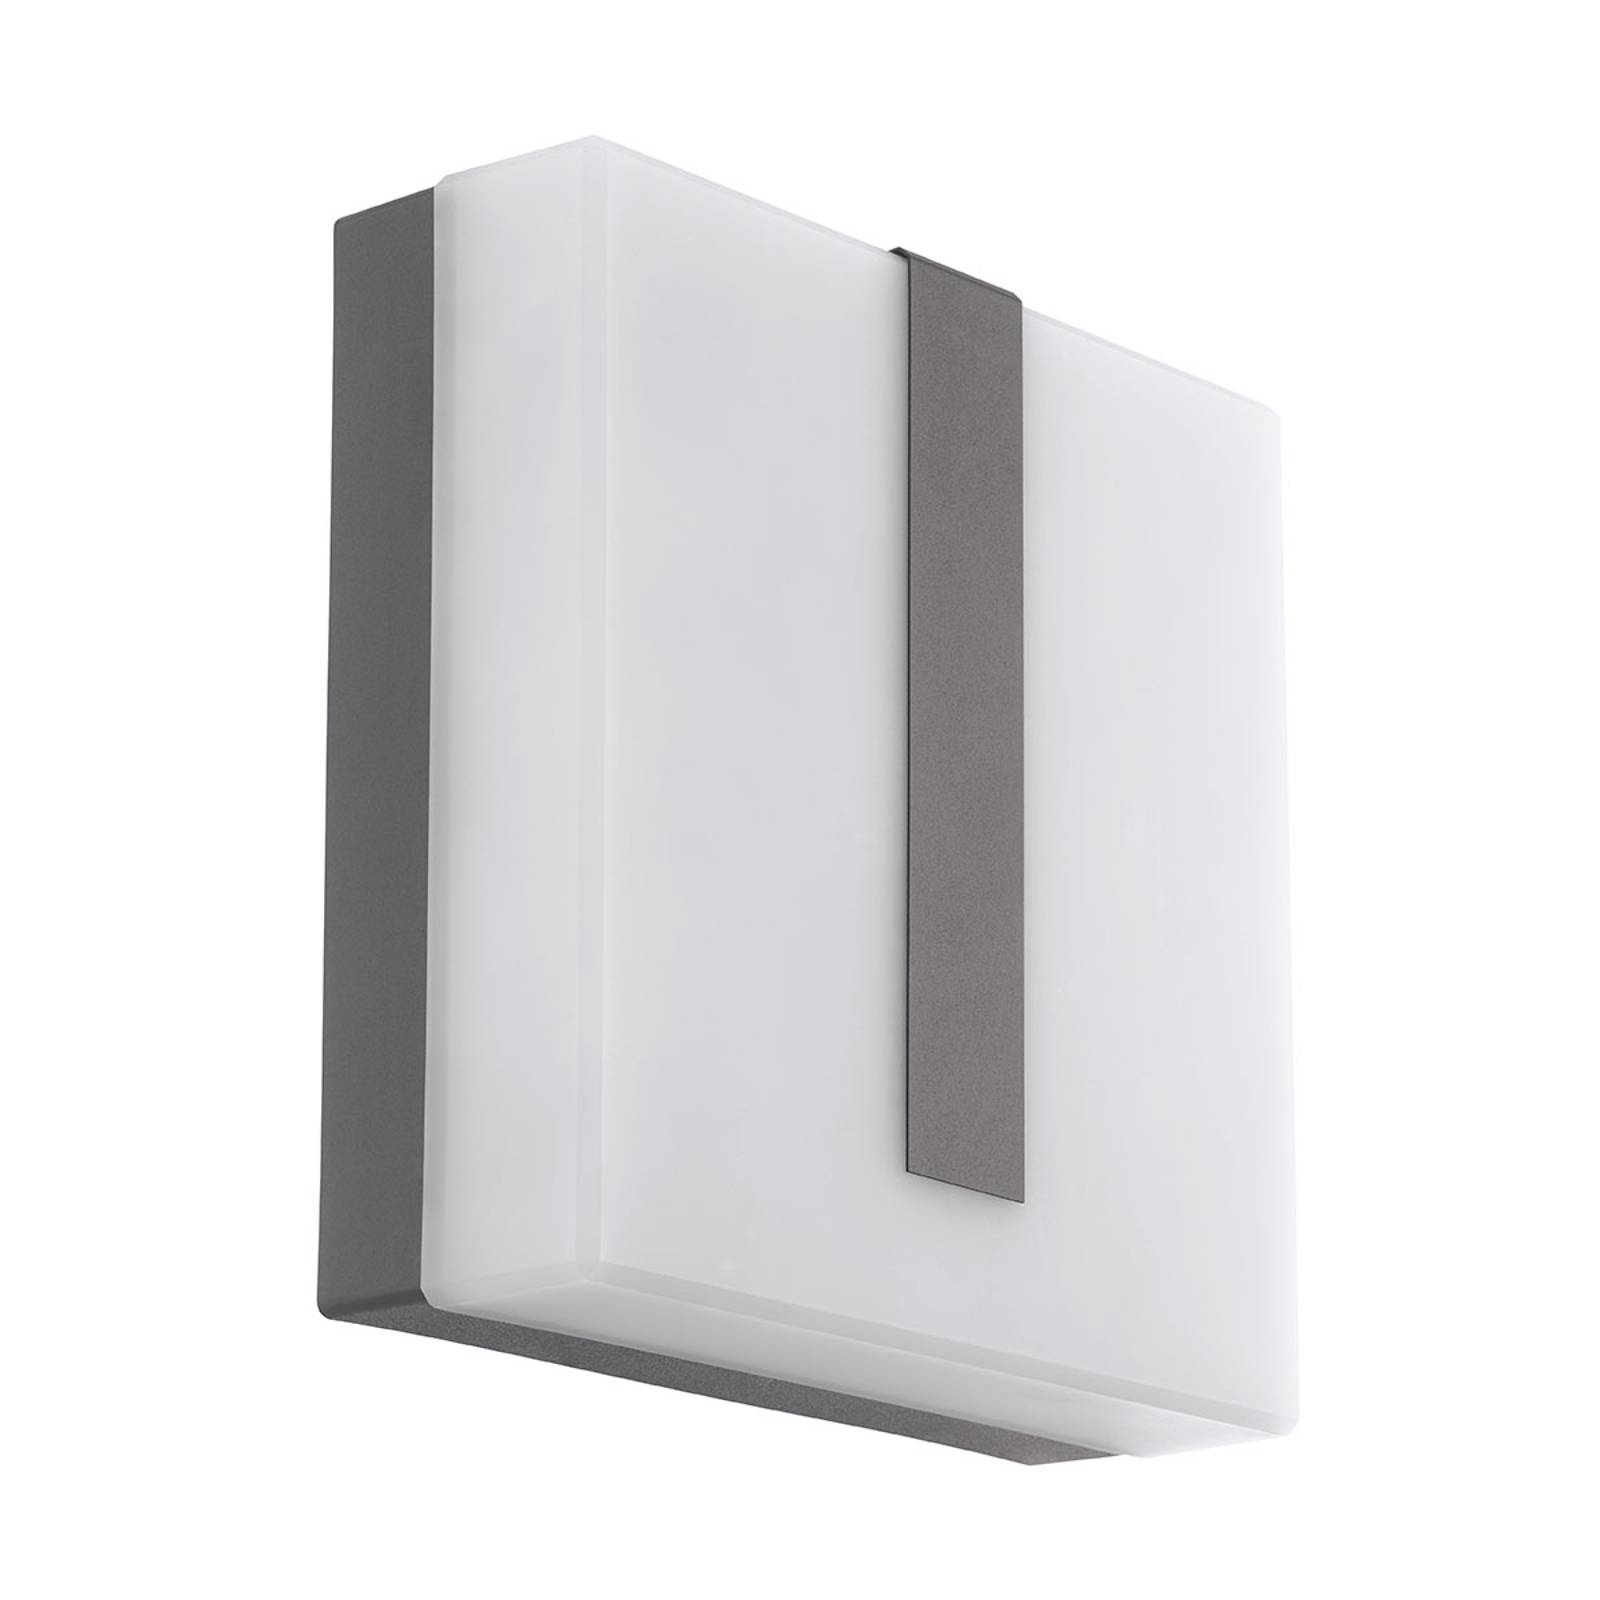 EGLO connect Torazza-C LED buitenwandlamp